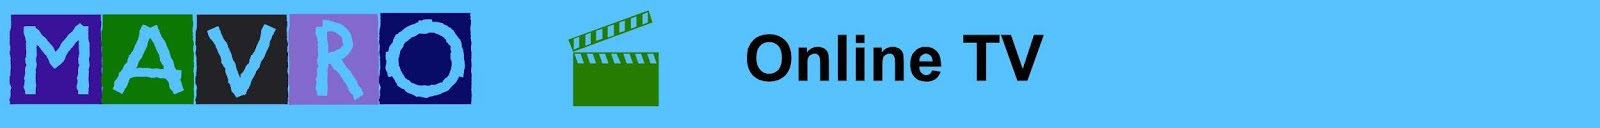 Mavro-Онлайн-ТВ | Бесплатно | 1001 канал | Новости |  Фильмы | Музыка | Вебкамеры мира онлайн